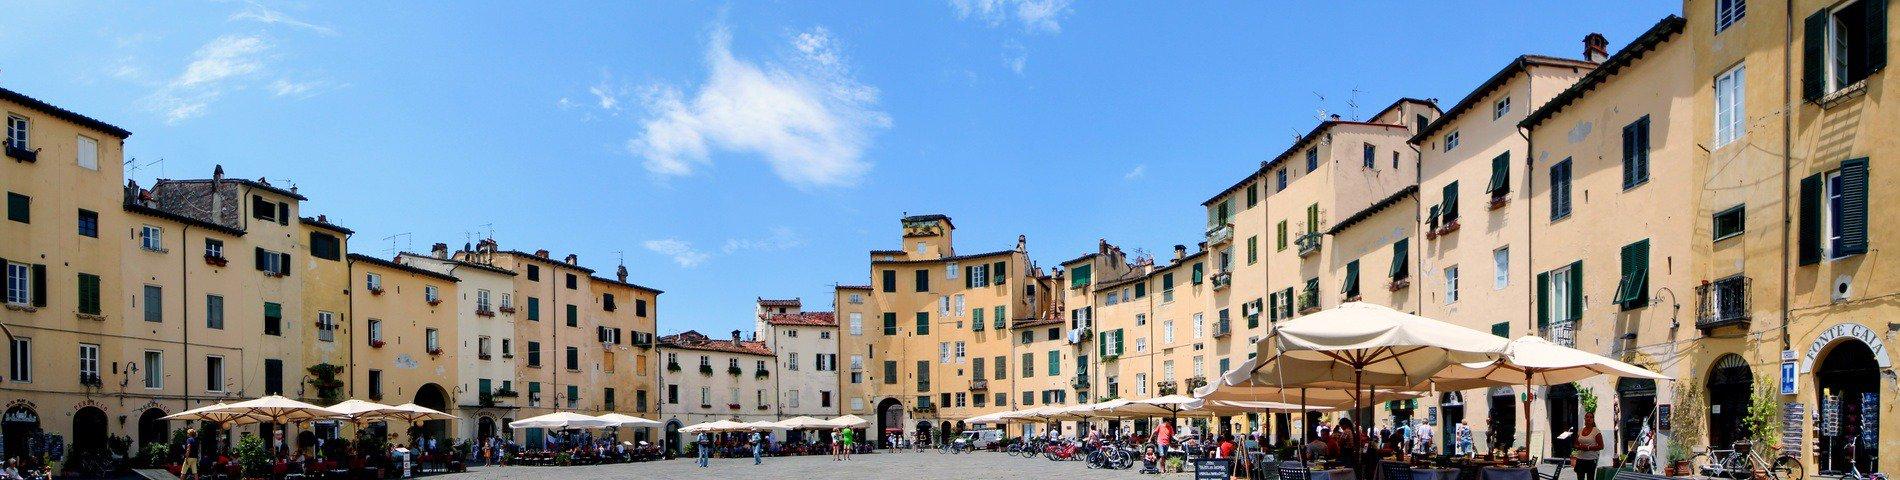 Lucca Tour